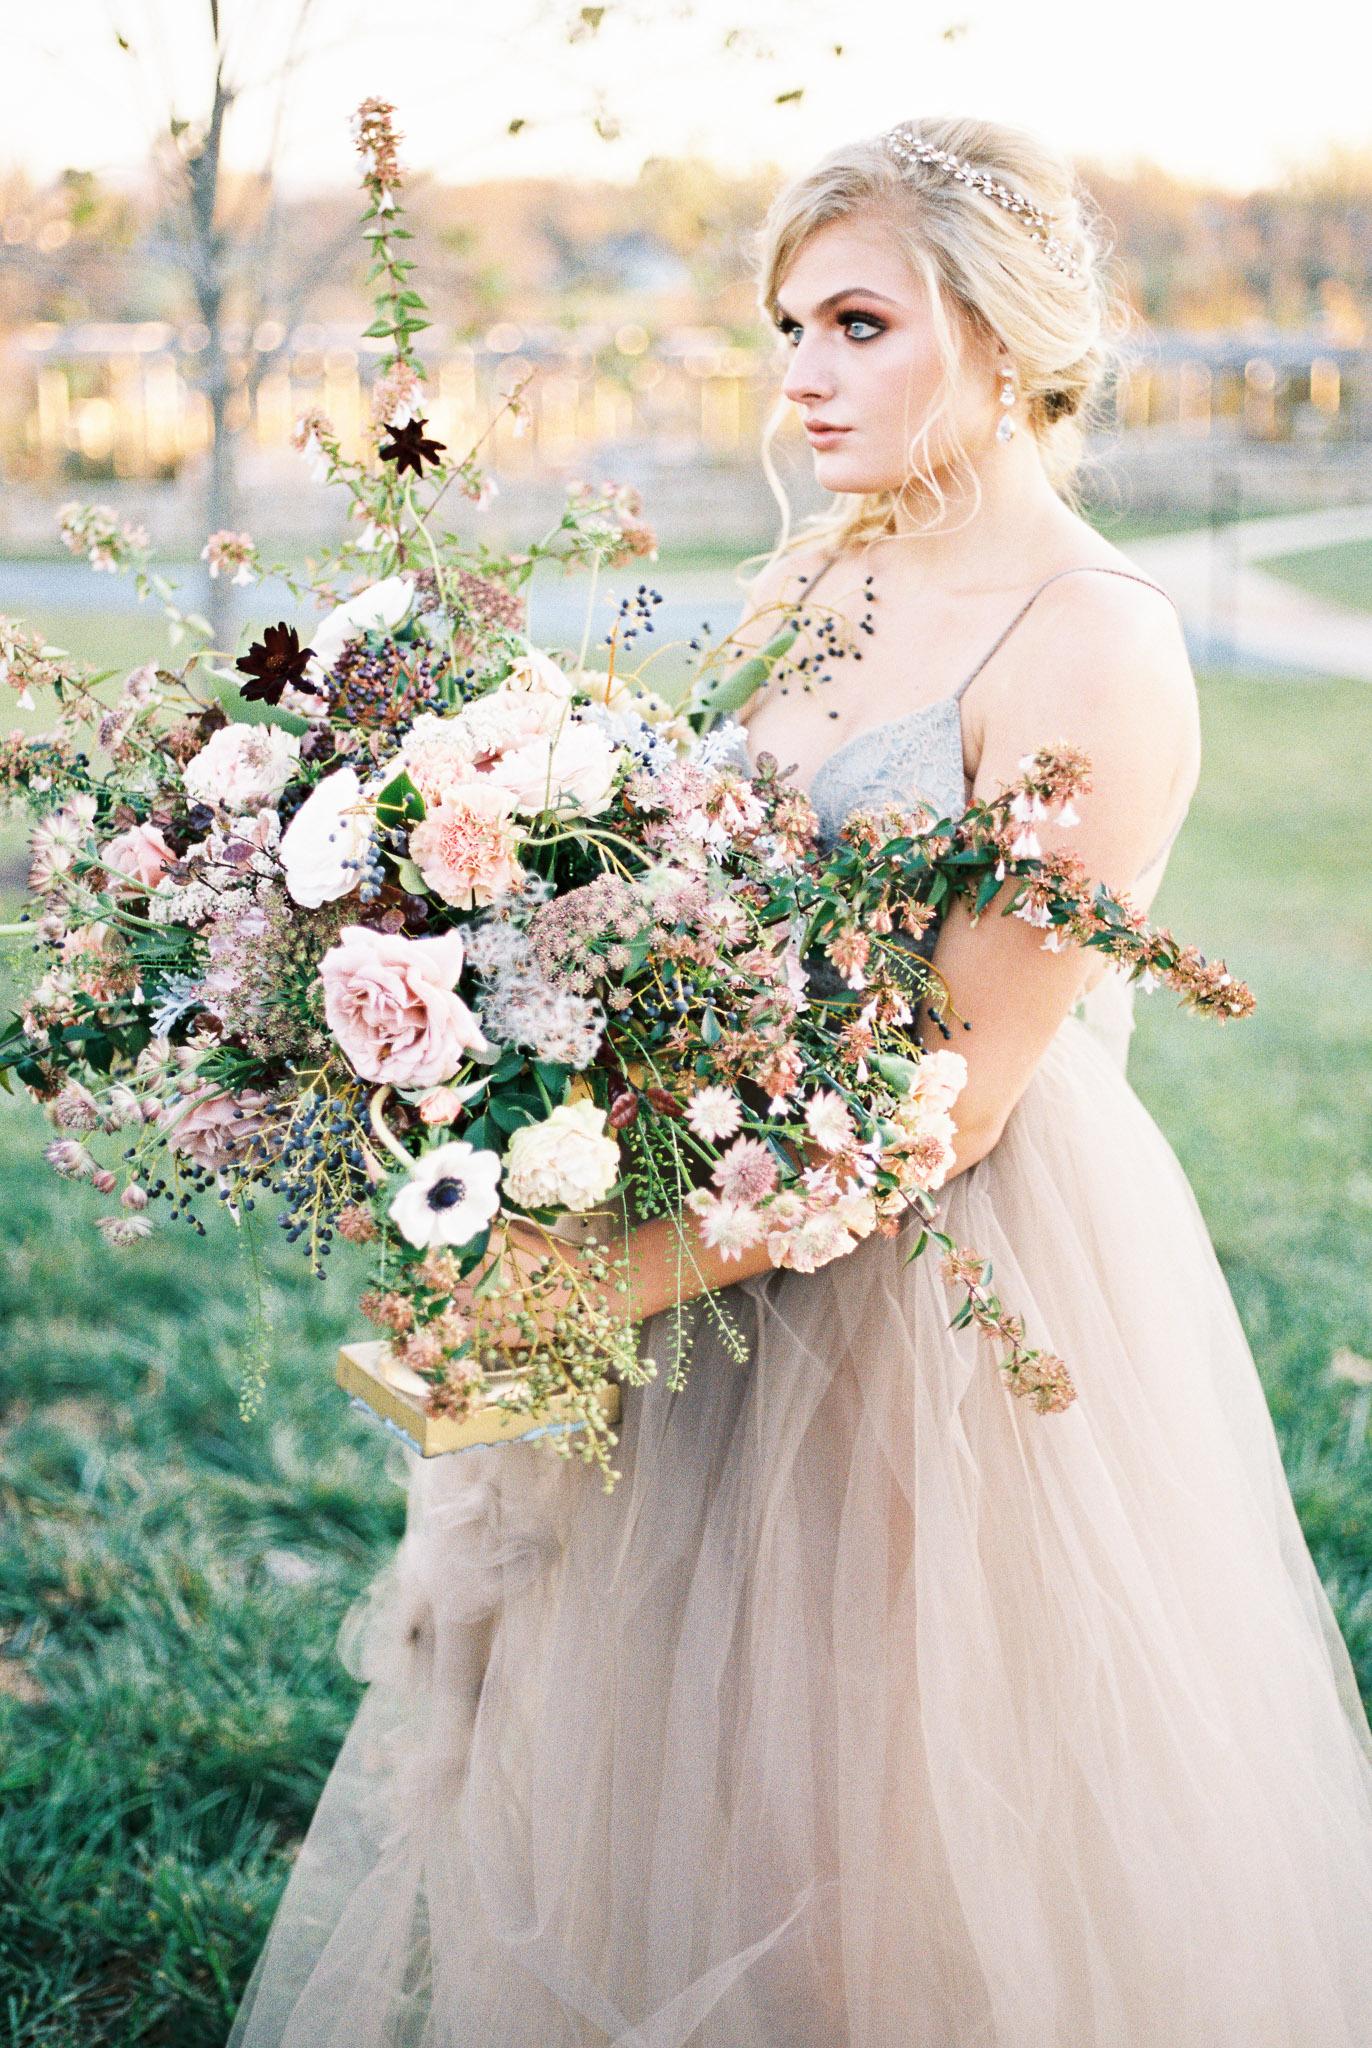 holly-chapple-flowers-ltd-fine-art-centerpiece